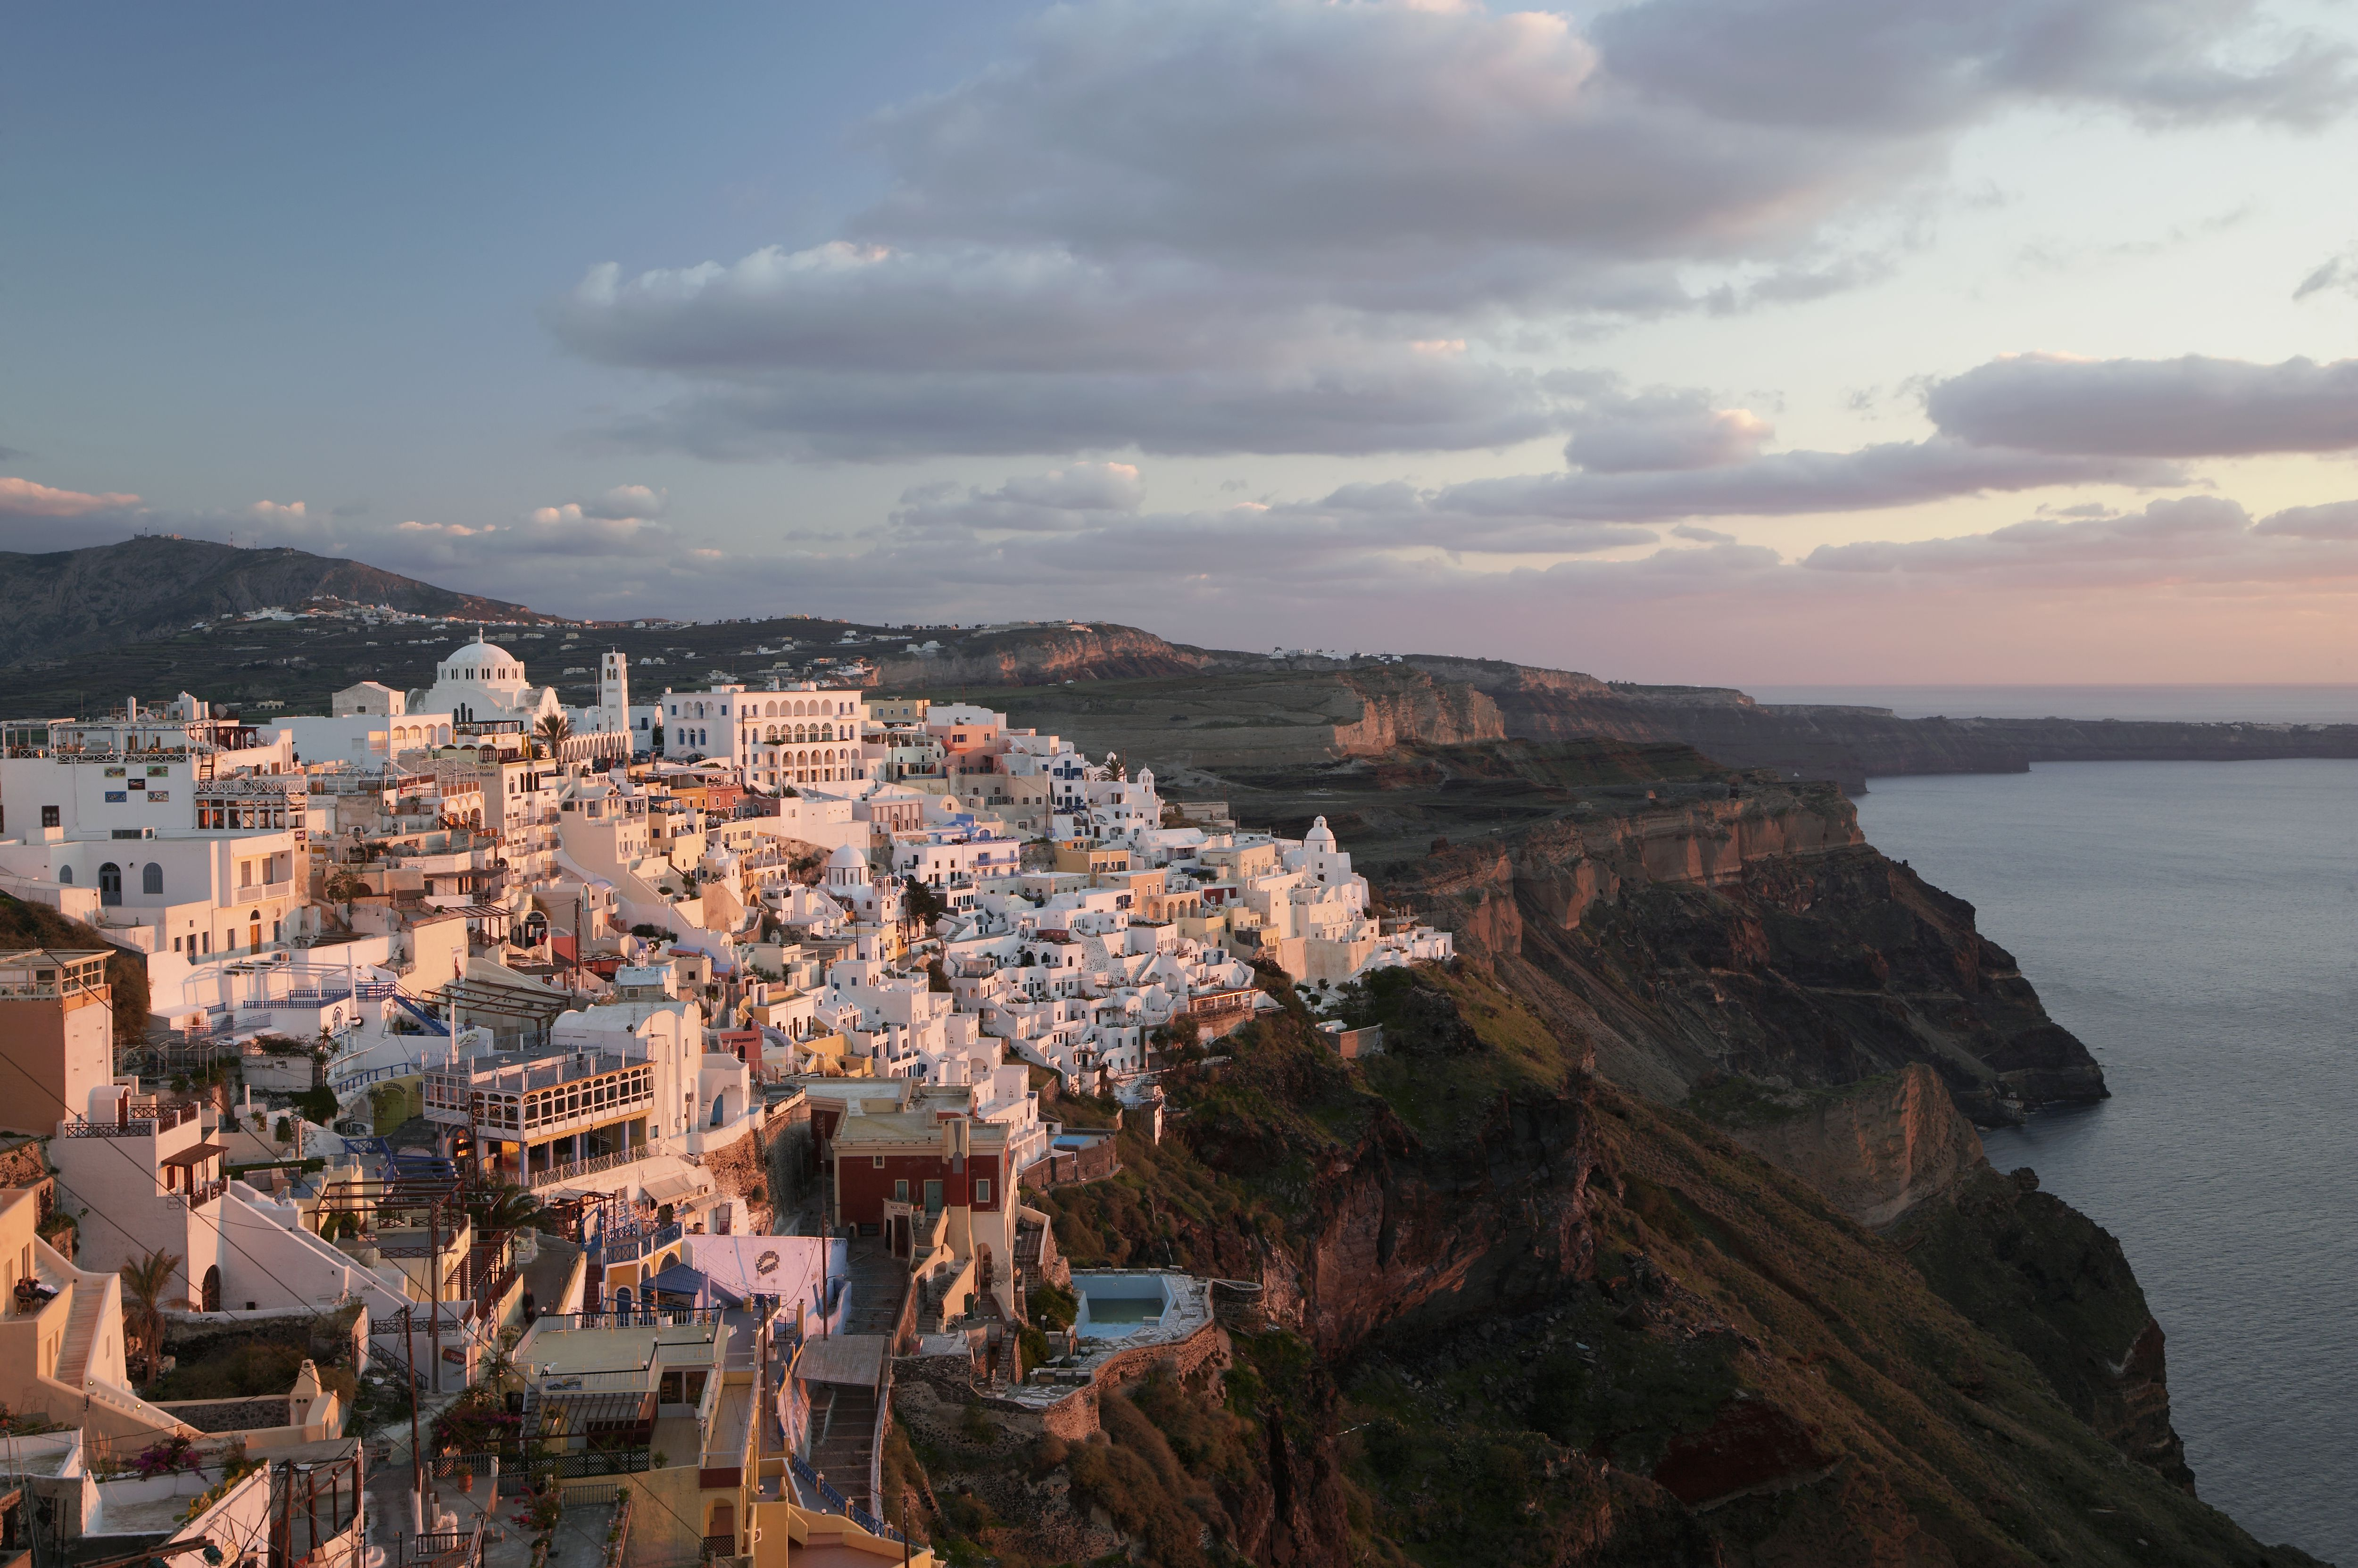 Greece, Santorini, Fira, cityscape, elevated view, dusk